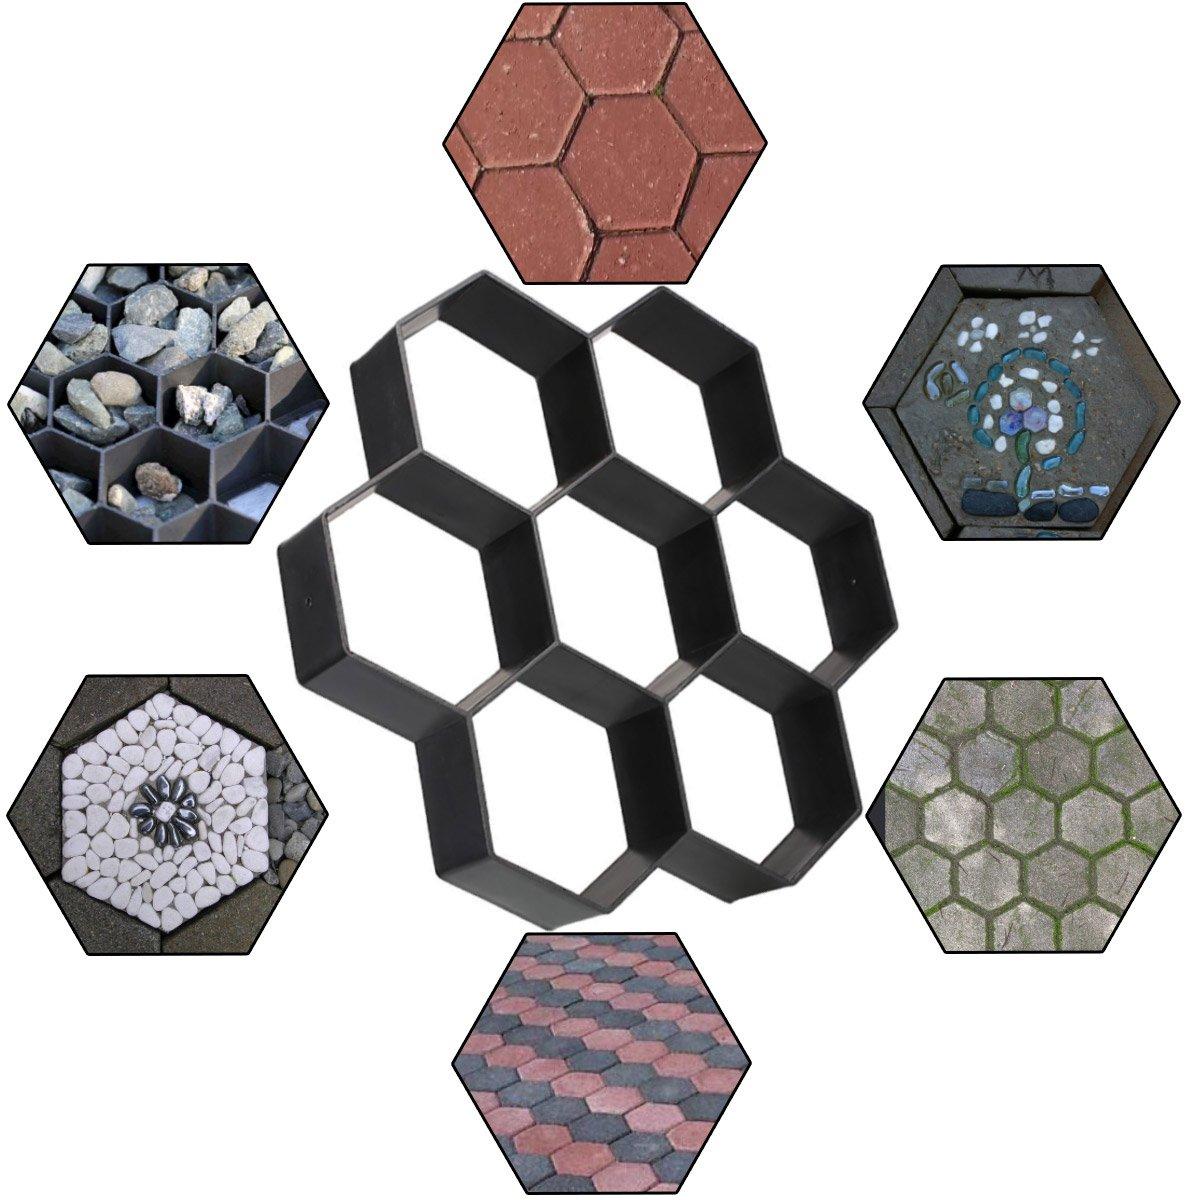 Walk Maker DIY Concrete Paver Molds Path Maker Mold, Reusable Garden Patio Walkways Hexagon Paving Stone Mold, 11.5'' x 11.5'' x 1.7'' Concrete Molds By STARVAST